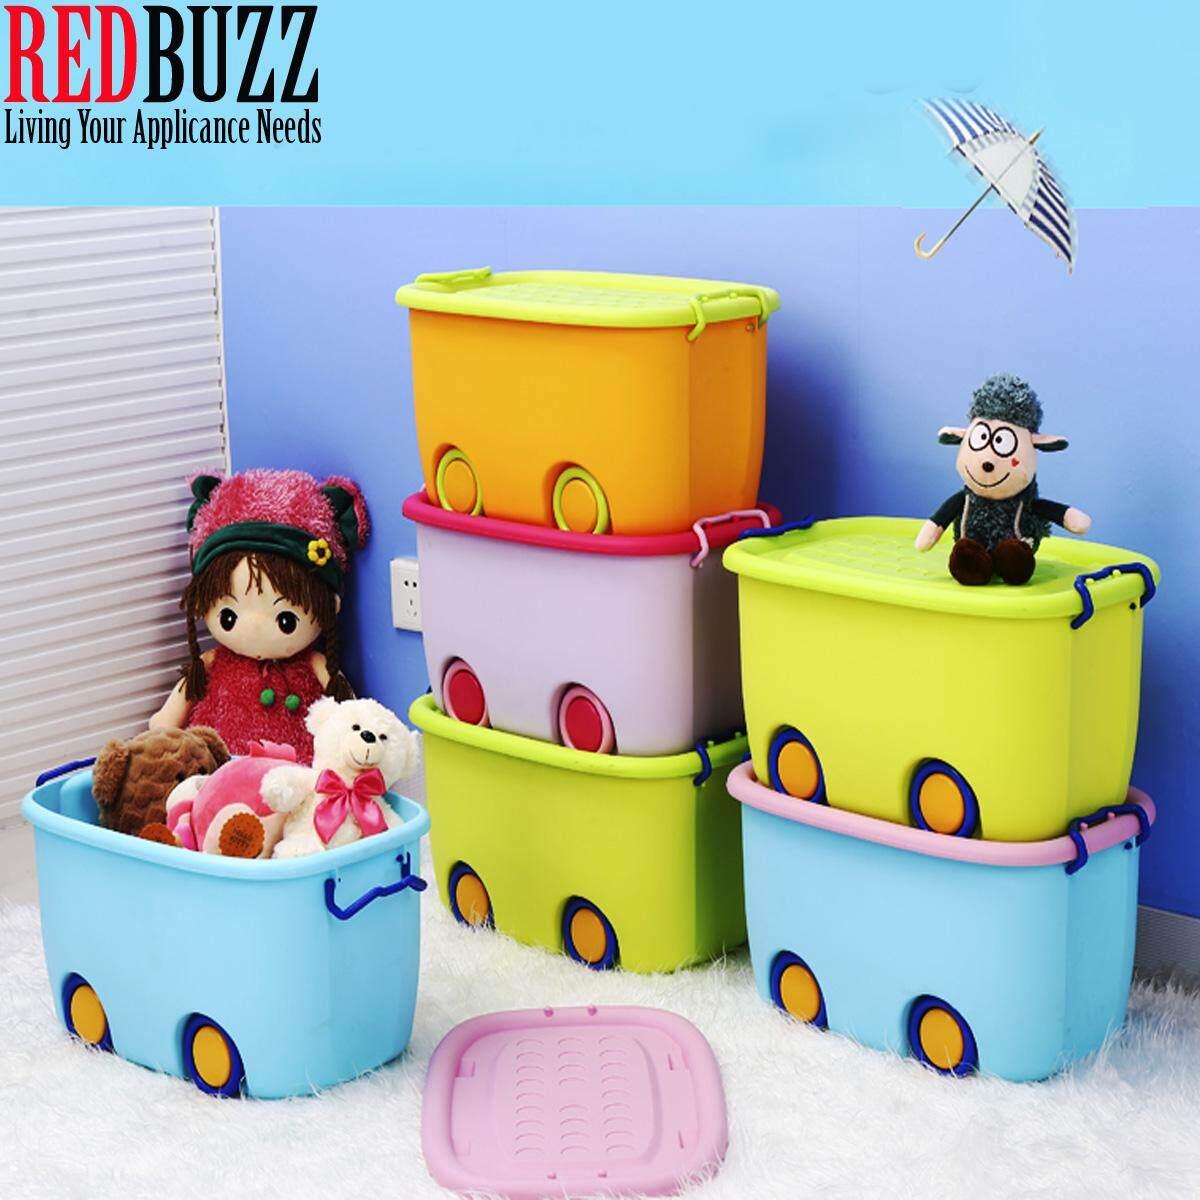 REDBUZZ Multipurpose Toy wheel Storage box Containers